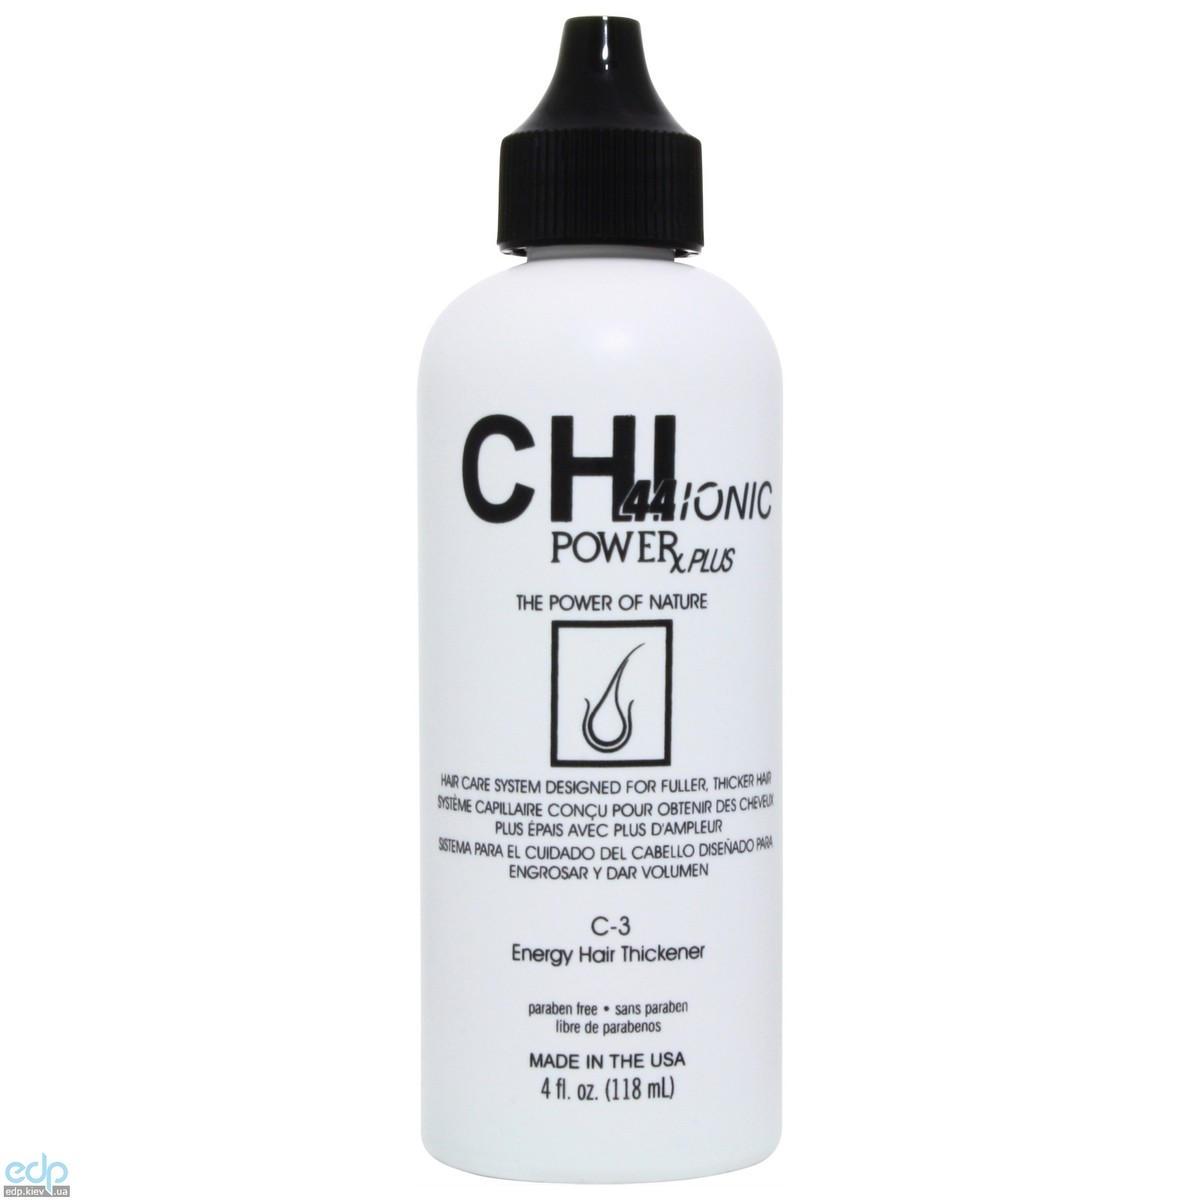 CHI 44 Ionic Power Plus Energy Thickener C-3 - Лосьон для кожи головы C-3 - 120 ml (арт. CHI5525)